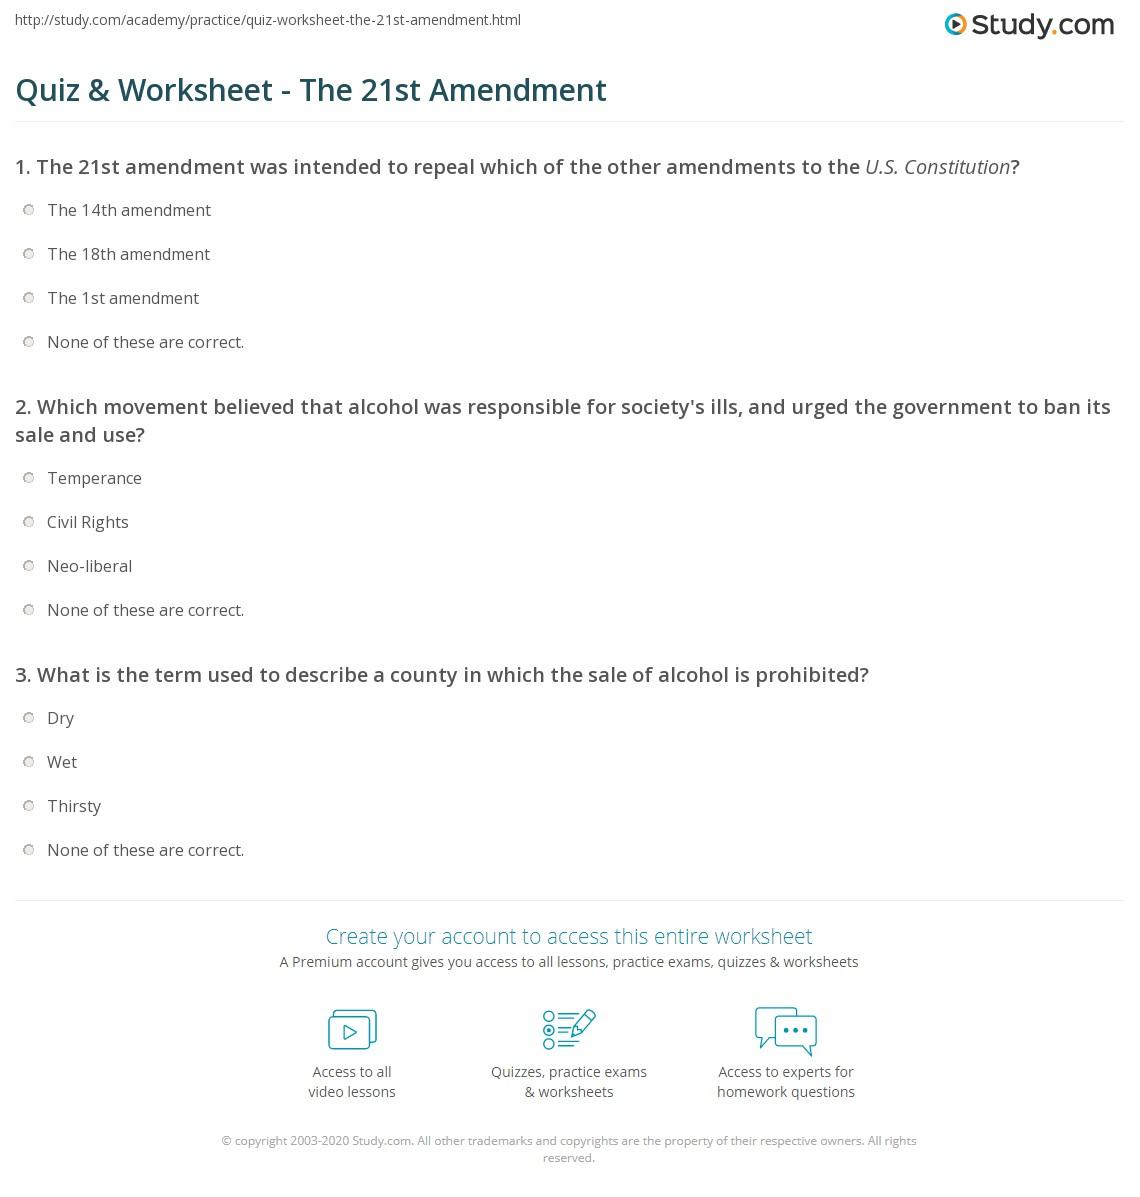 Workbooks us constitution worksheets : Quiz & Worksheet - The 21st Amendment | Study.com